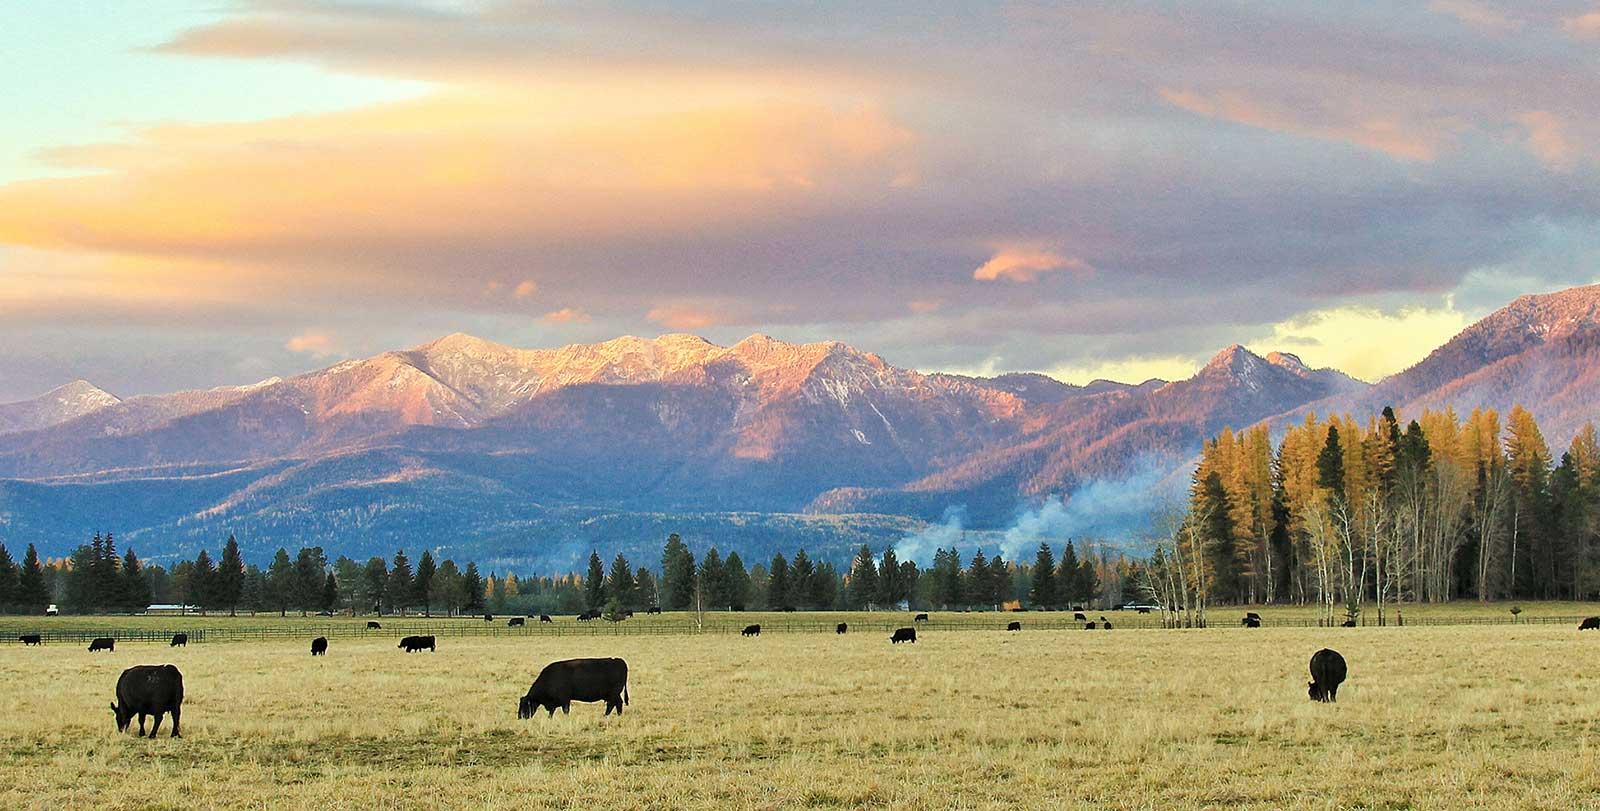 Montana - American Lands Council